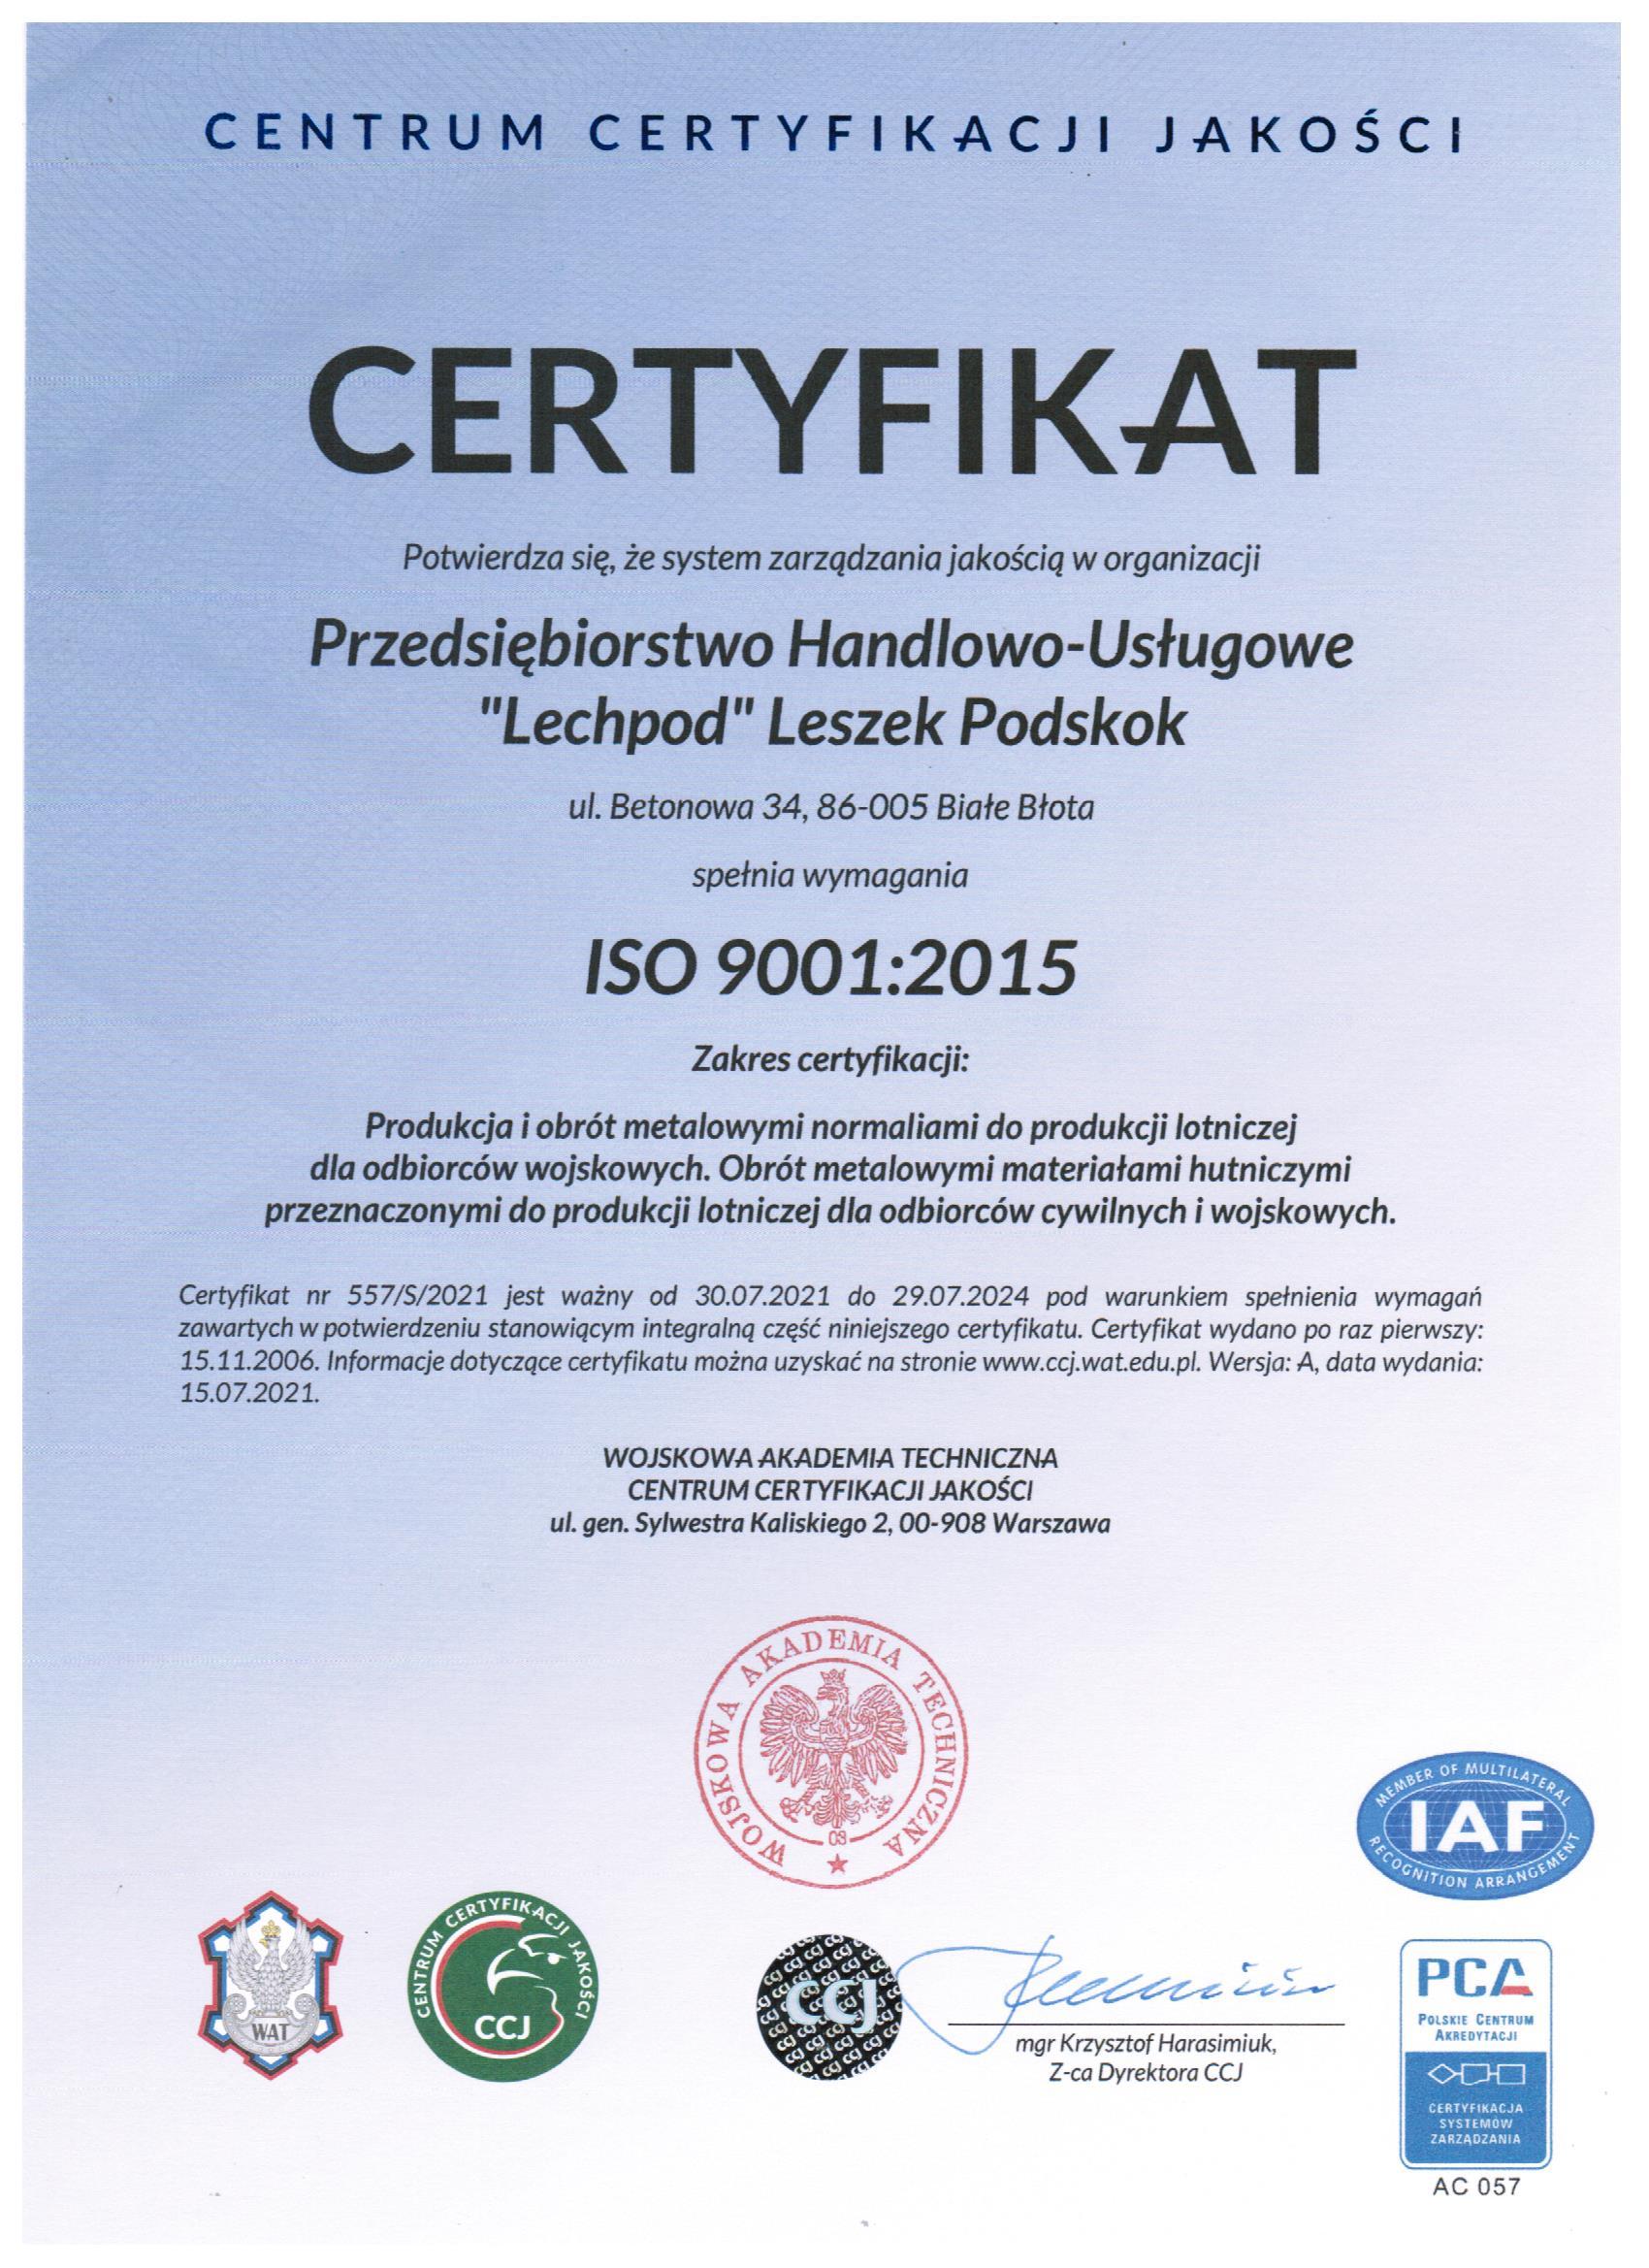 ISO 9001-2015 z 2021 roku